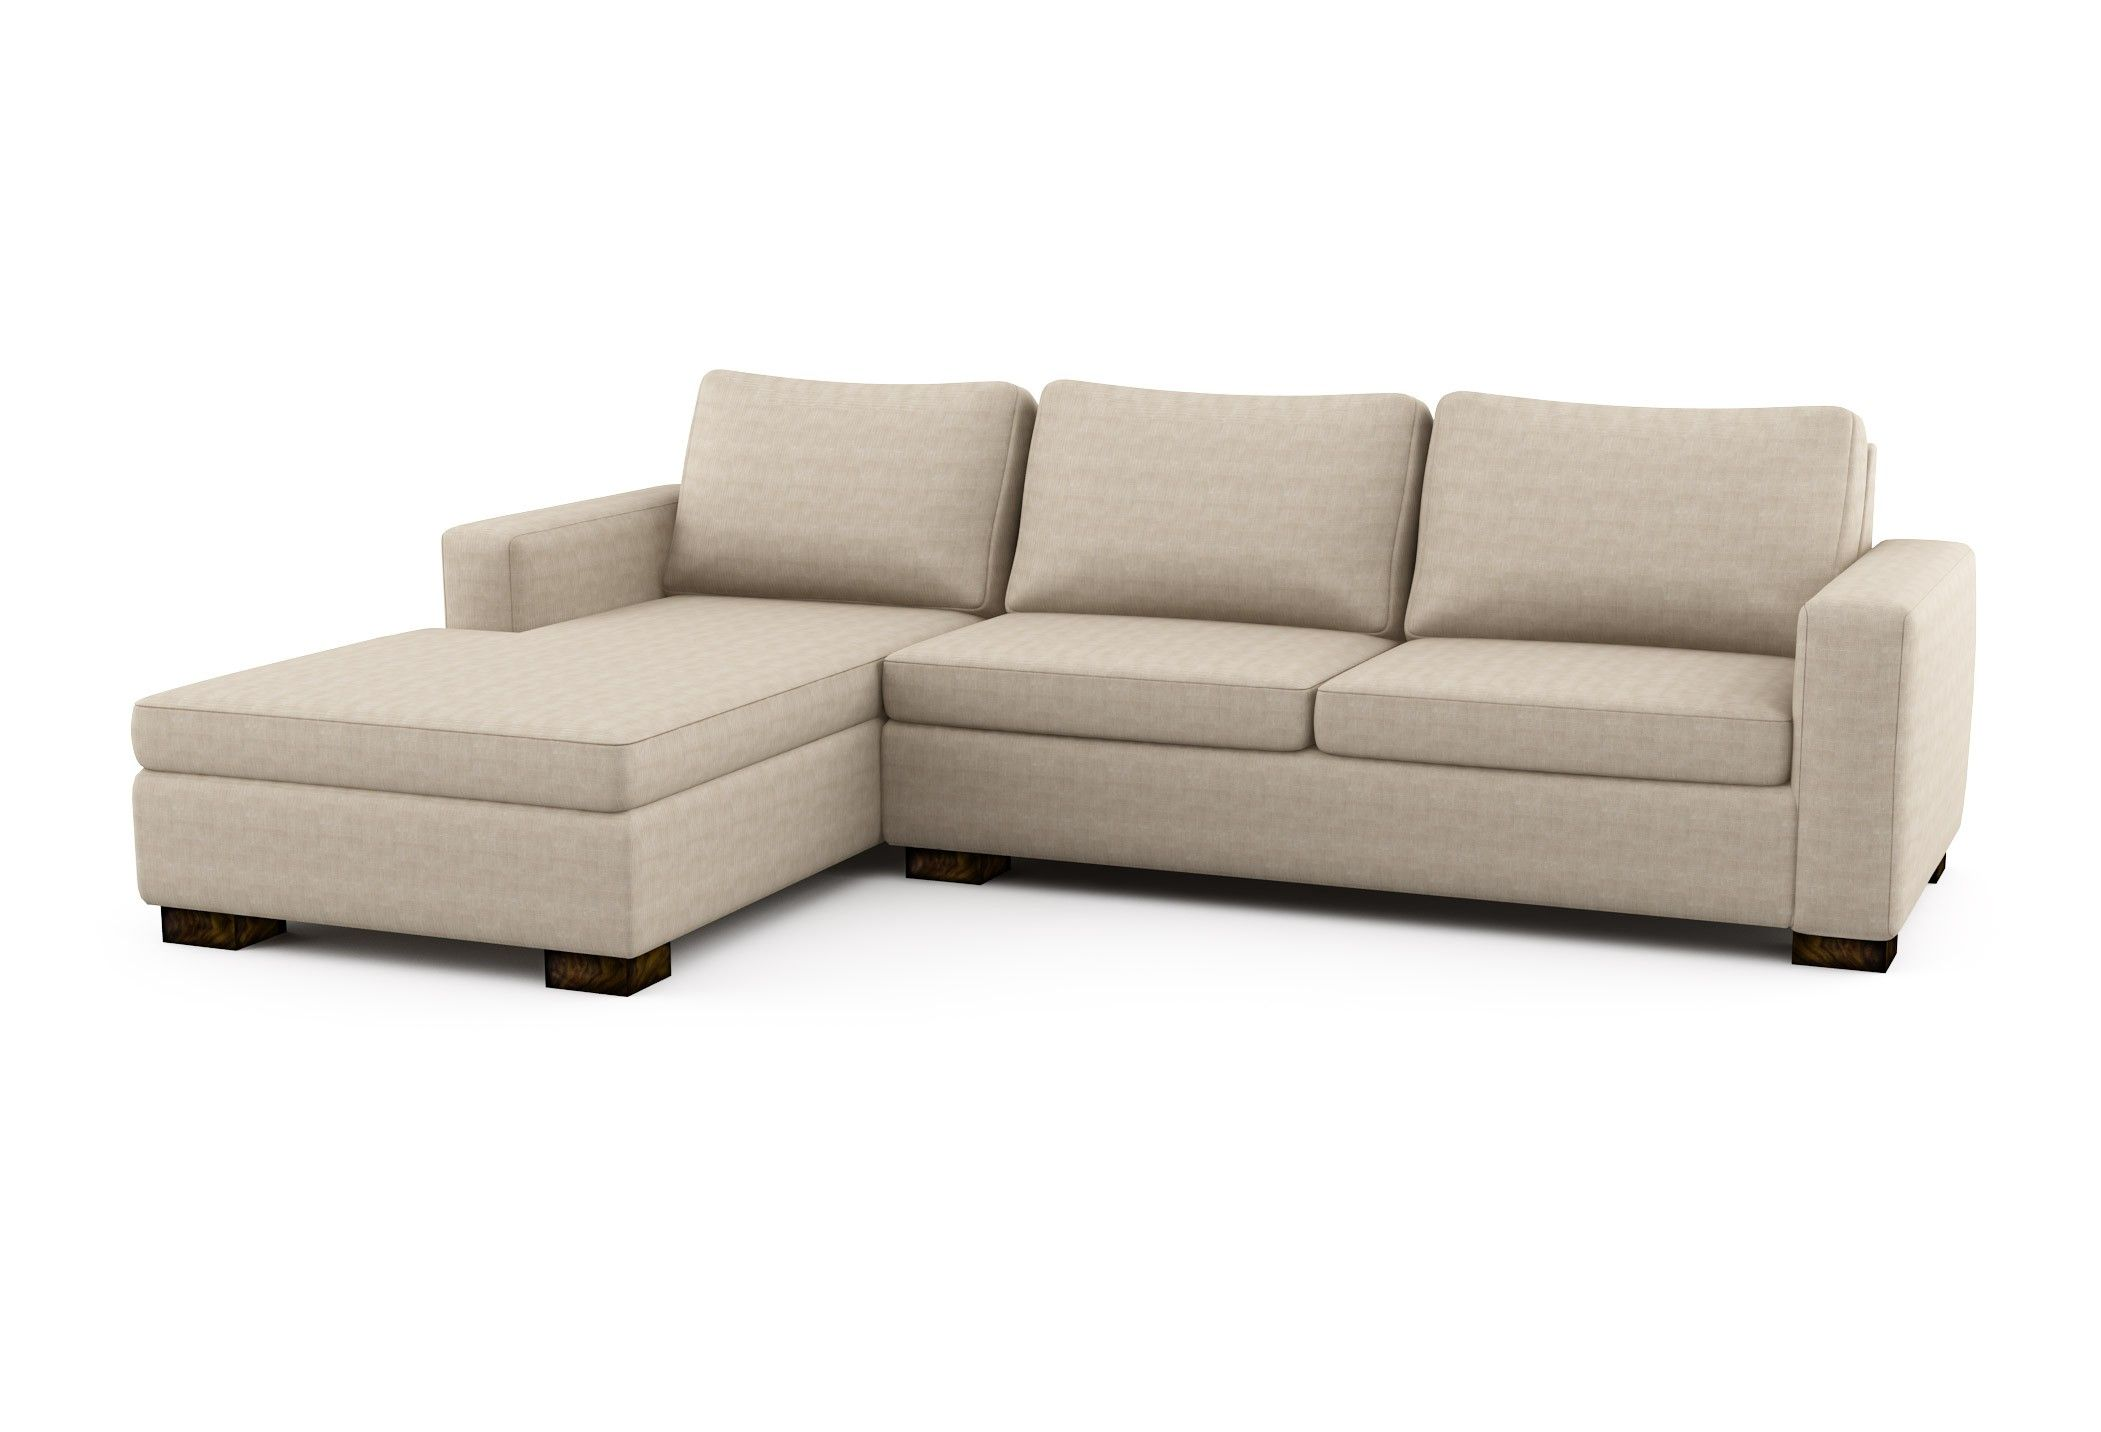 sofa w chaise kenton rio left sectional bed custom 4 370 00